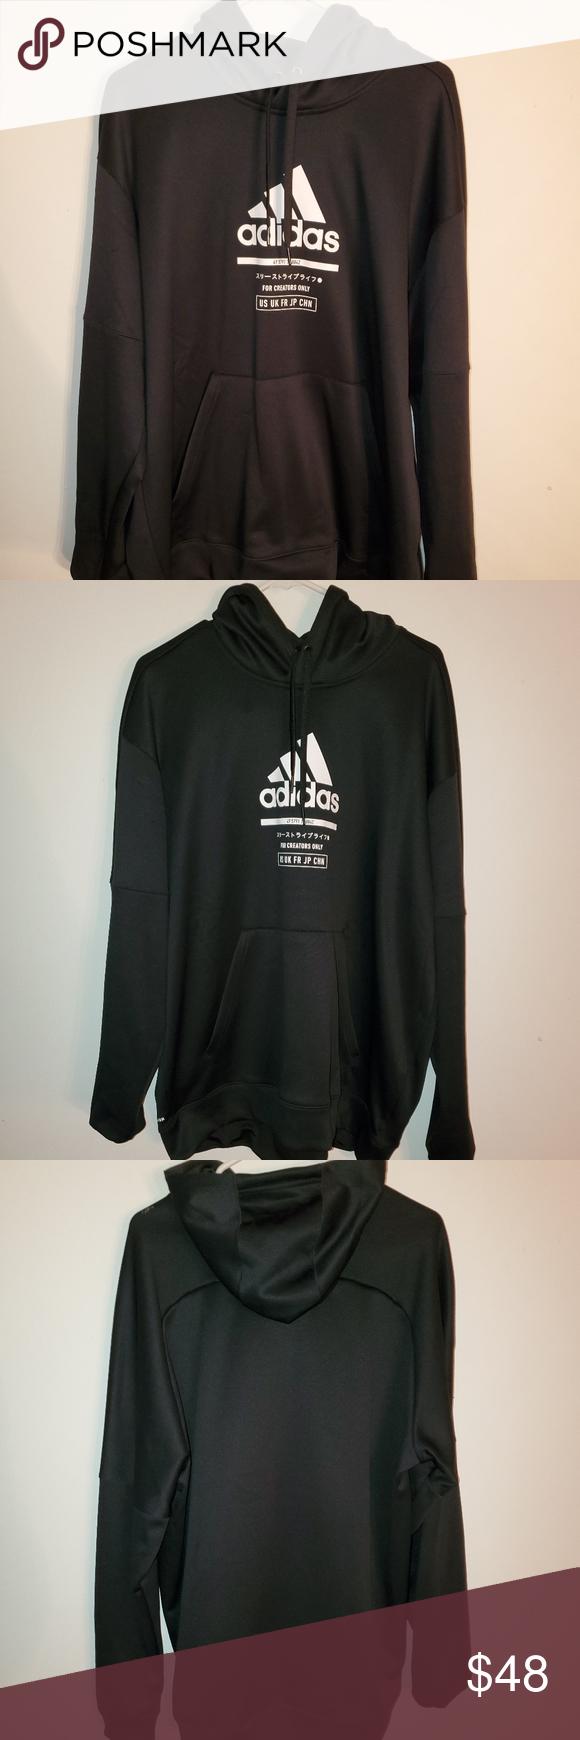 Nwot Men S Adidas Sweatshirt Size 2xl Adidas Sweatshirt White Adidas Sweatshirts [ 1740 x 580 Pixel ]